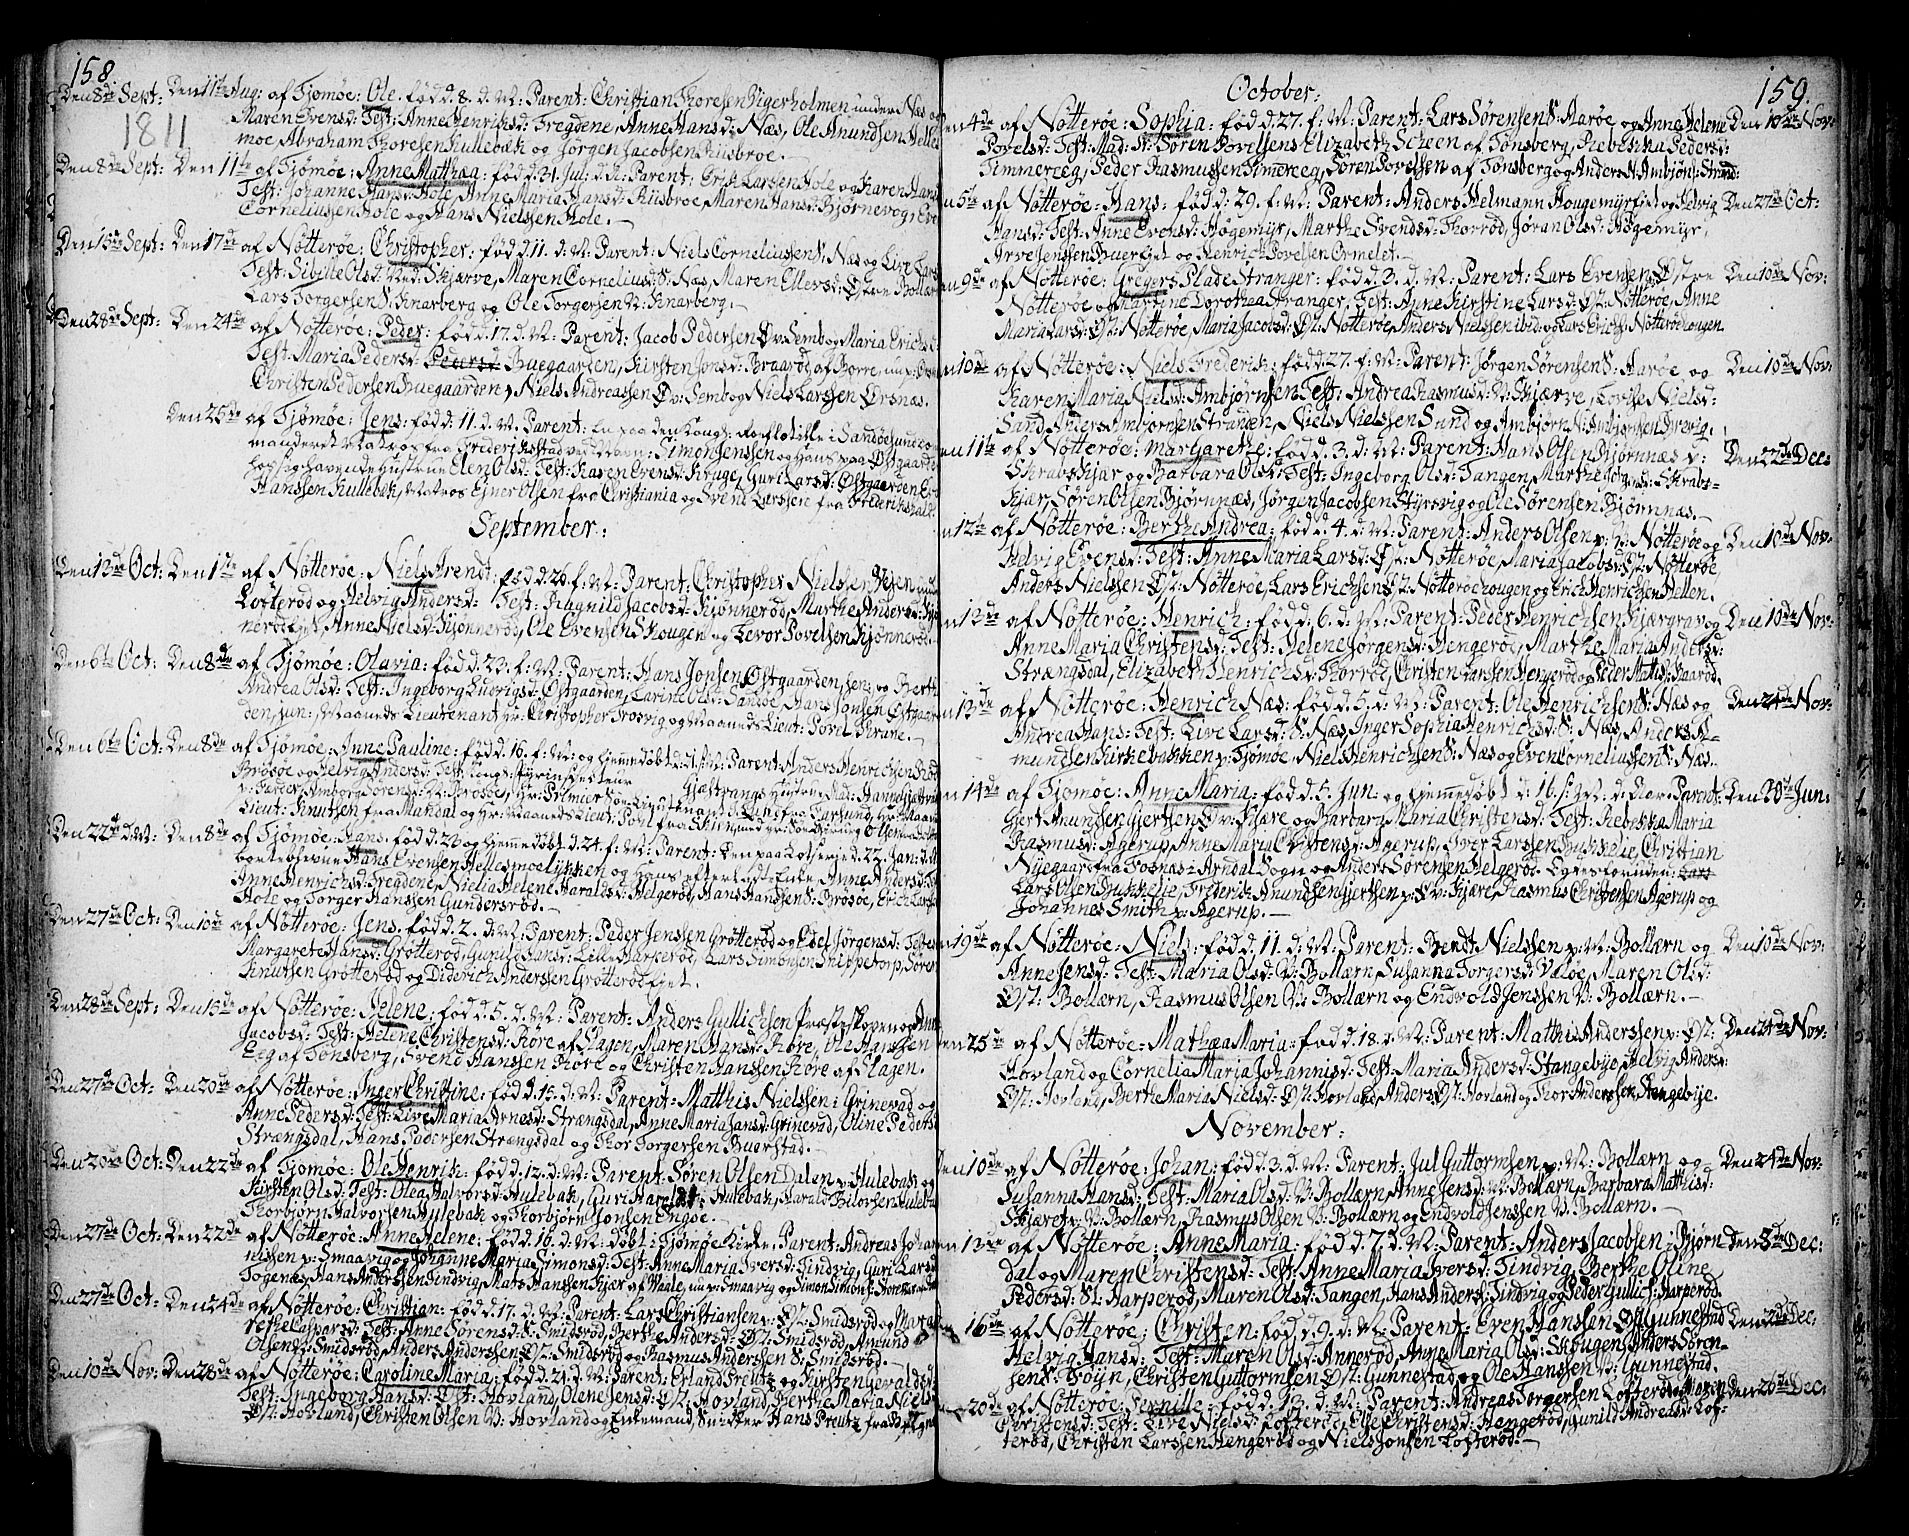 SAKO, Nøtterøy kirkebøker, F/Fa/L0003: Ministerialbok nr. I 3, 1791-1814, s. 158-159